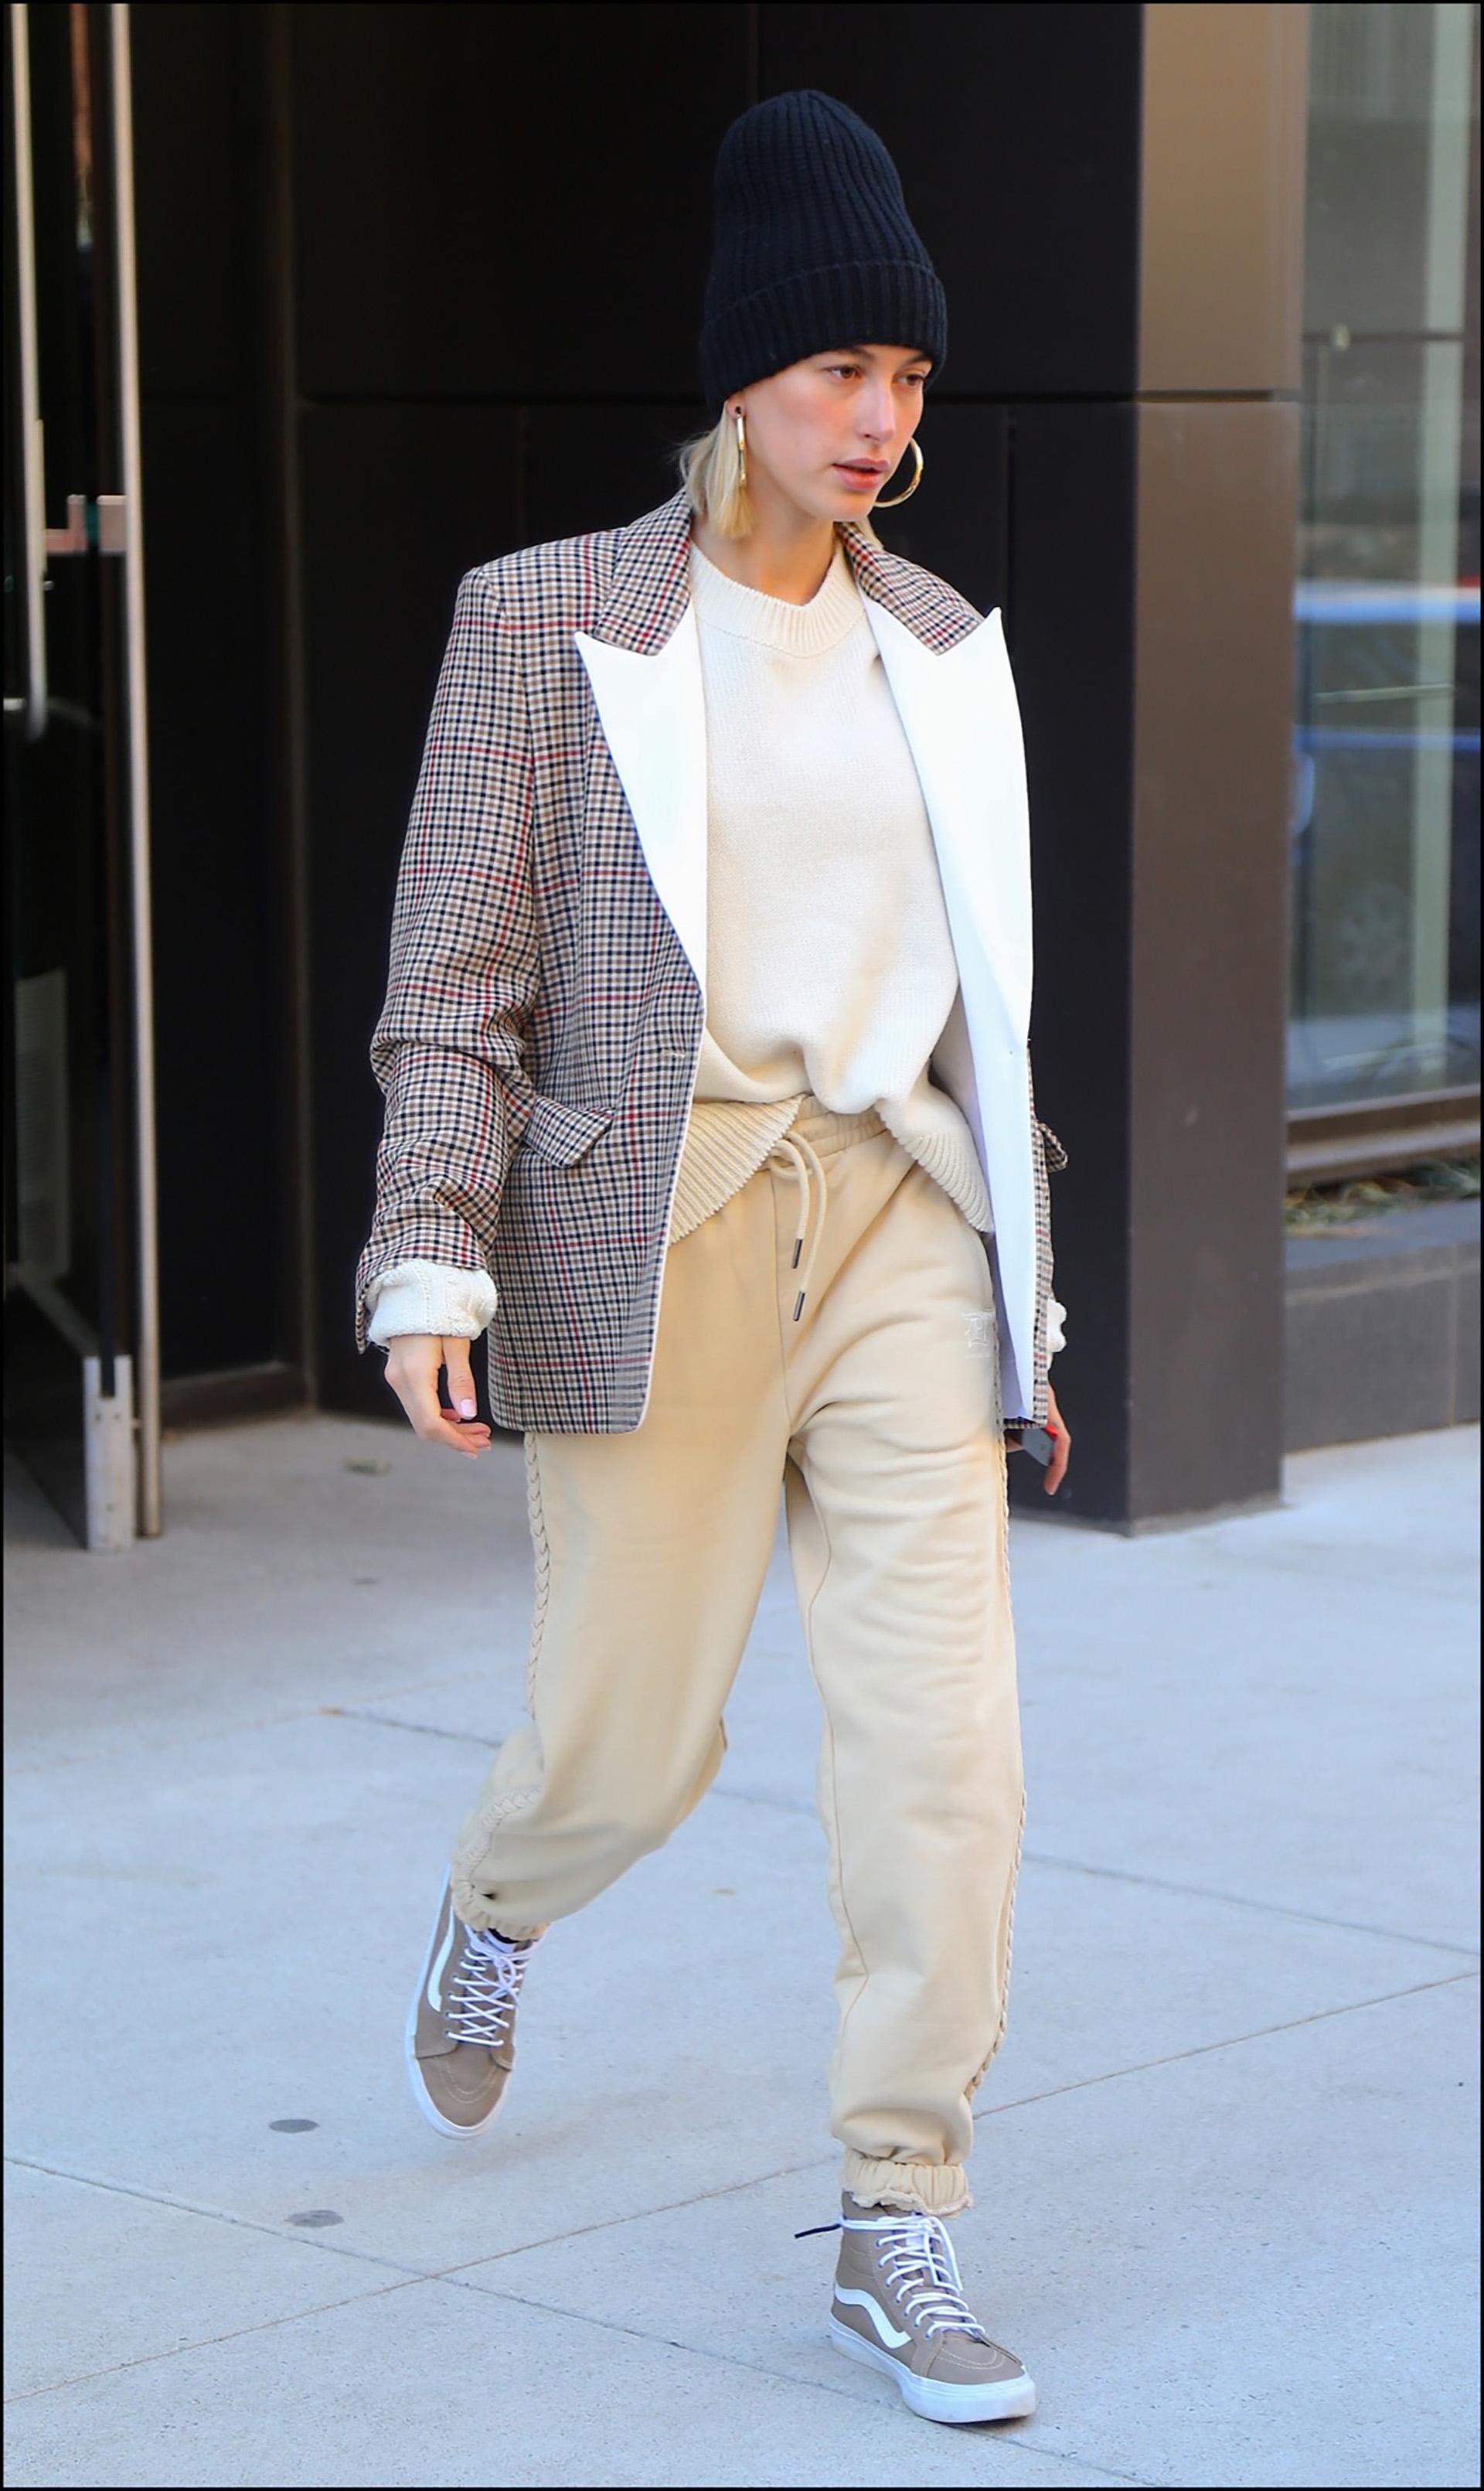 Hailey Baldwin sort de son domicile ‡ New York le 26 fÈvrier 2019. Hailey Baldwin Bieber is seen leaving her apartment in New York, on February 26th 2019.